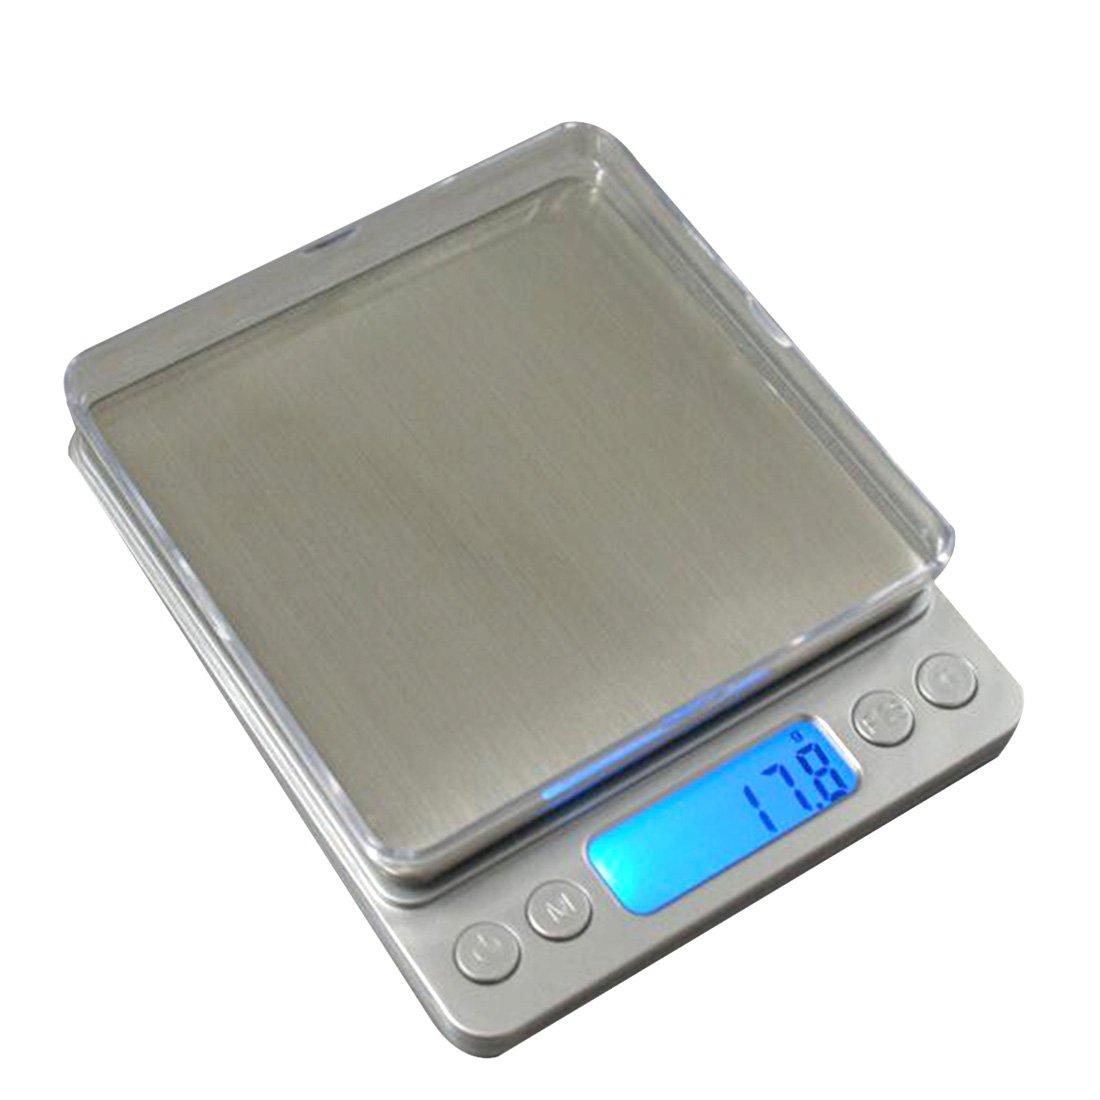 Haushalt Kü chenwaagen LCD Display Skala Digital elektronische Kü che Nahrungsmitteldiä t Tasche 1000g / 0.1g Waage rongwen LEPTS3025